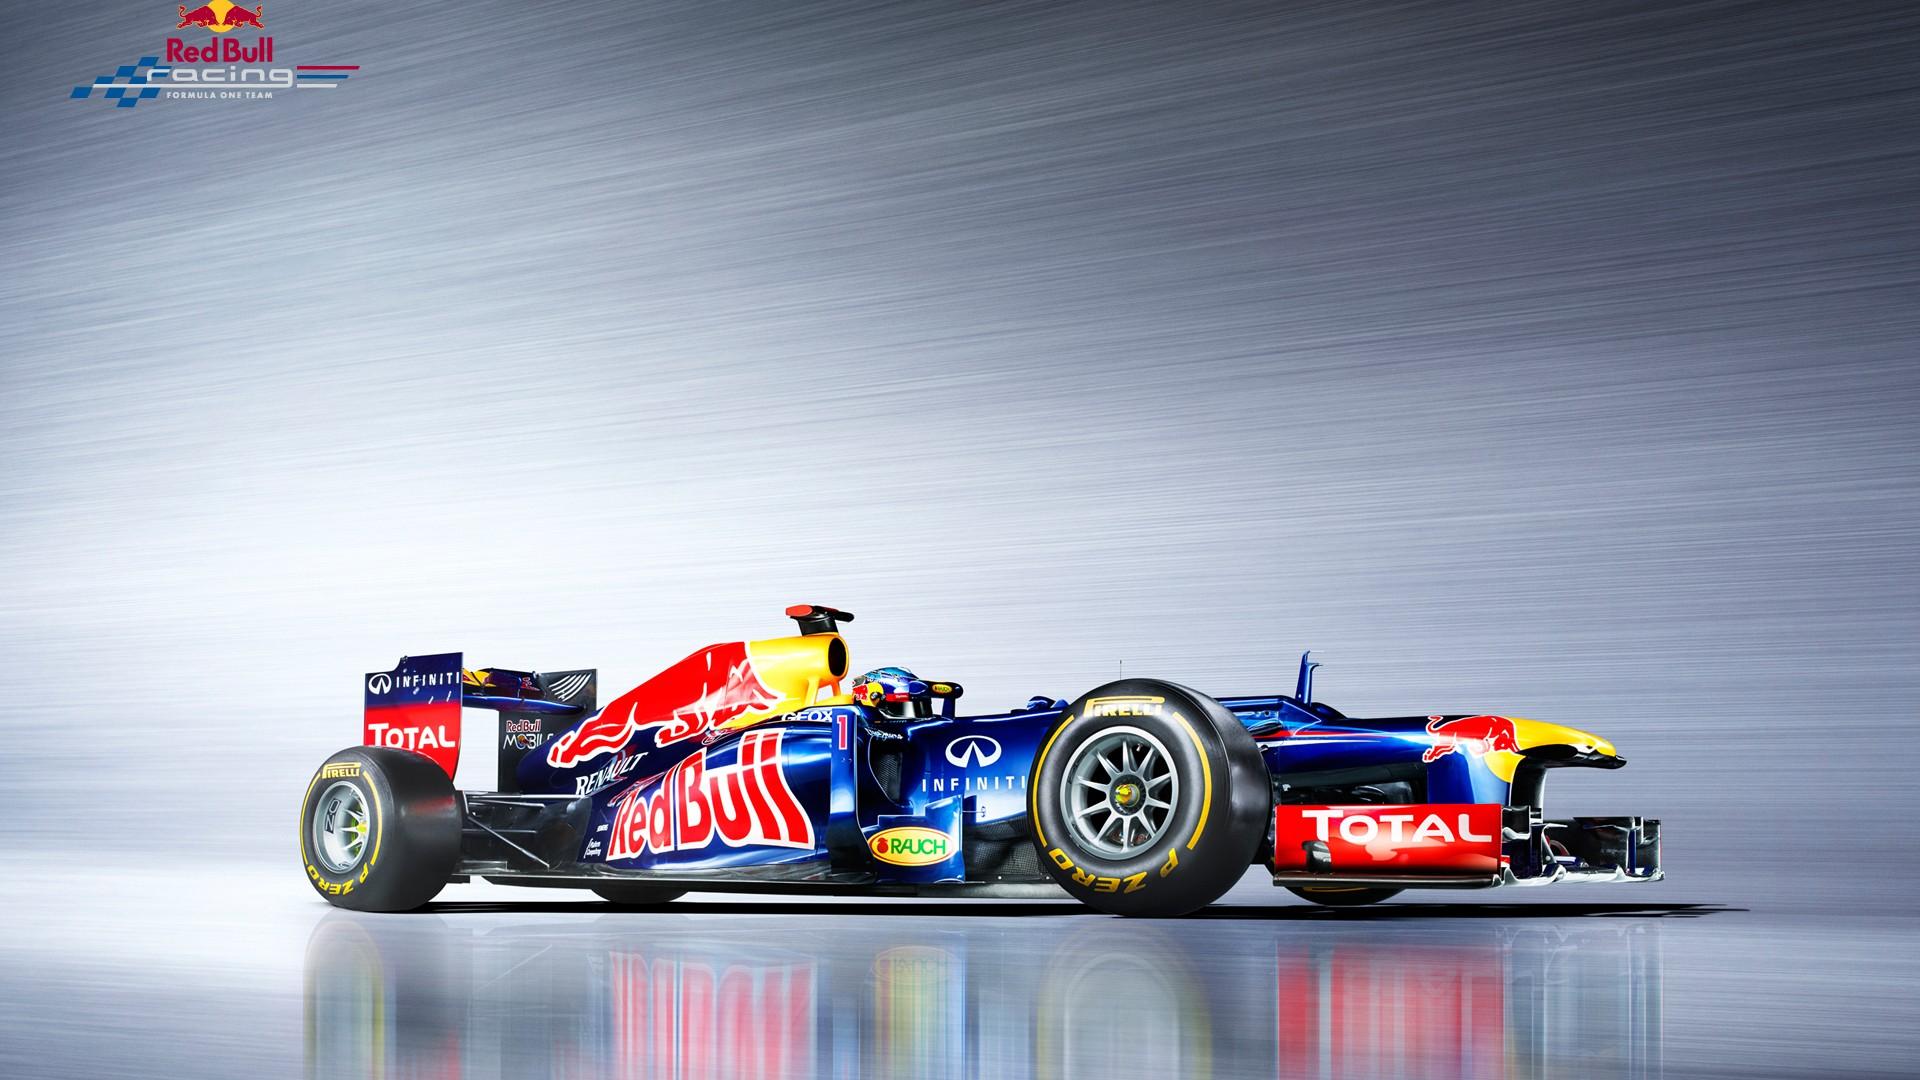 ... F1 wallpaper 8 ...